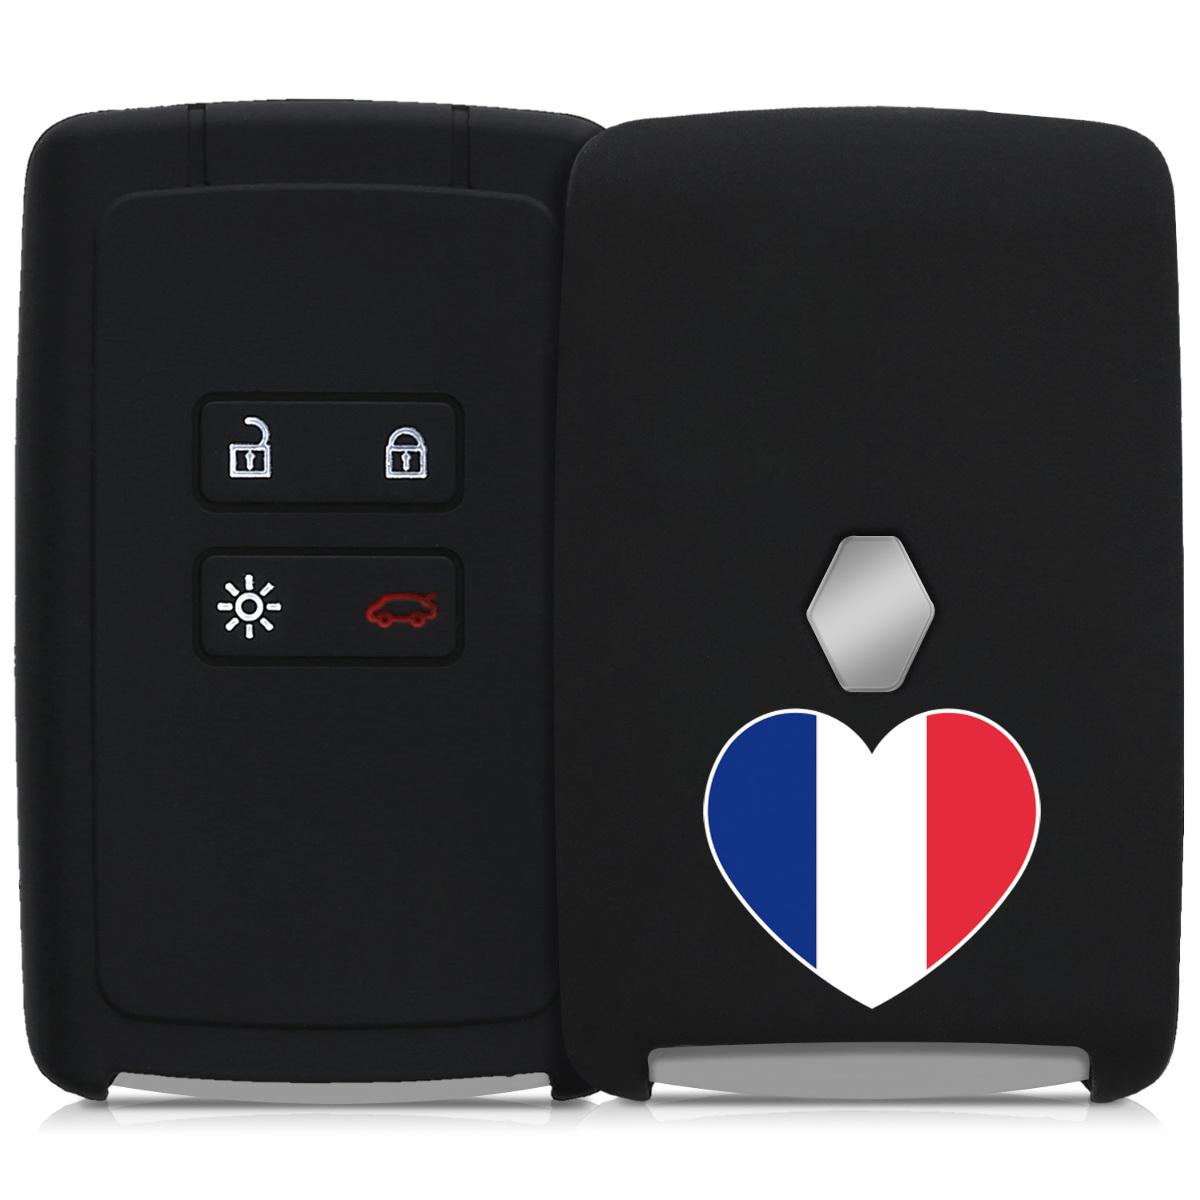 KW Silicone Θήκη Κλειδιού Renault - 4 Κουμπιά - Keyless Go - Blue / Red / Black (44709.26)